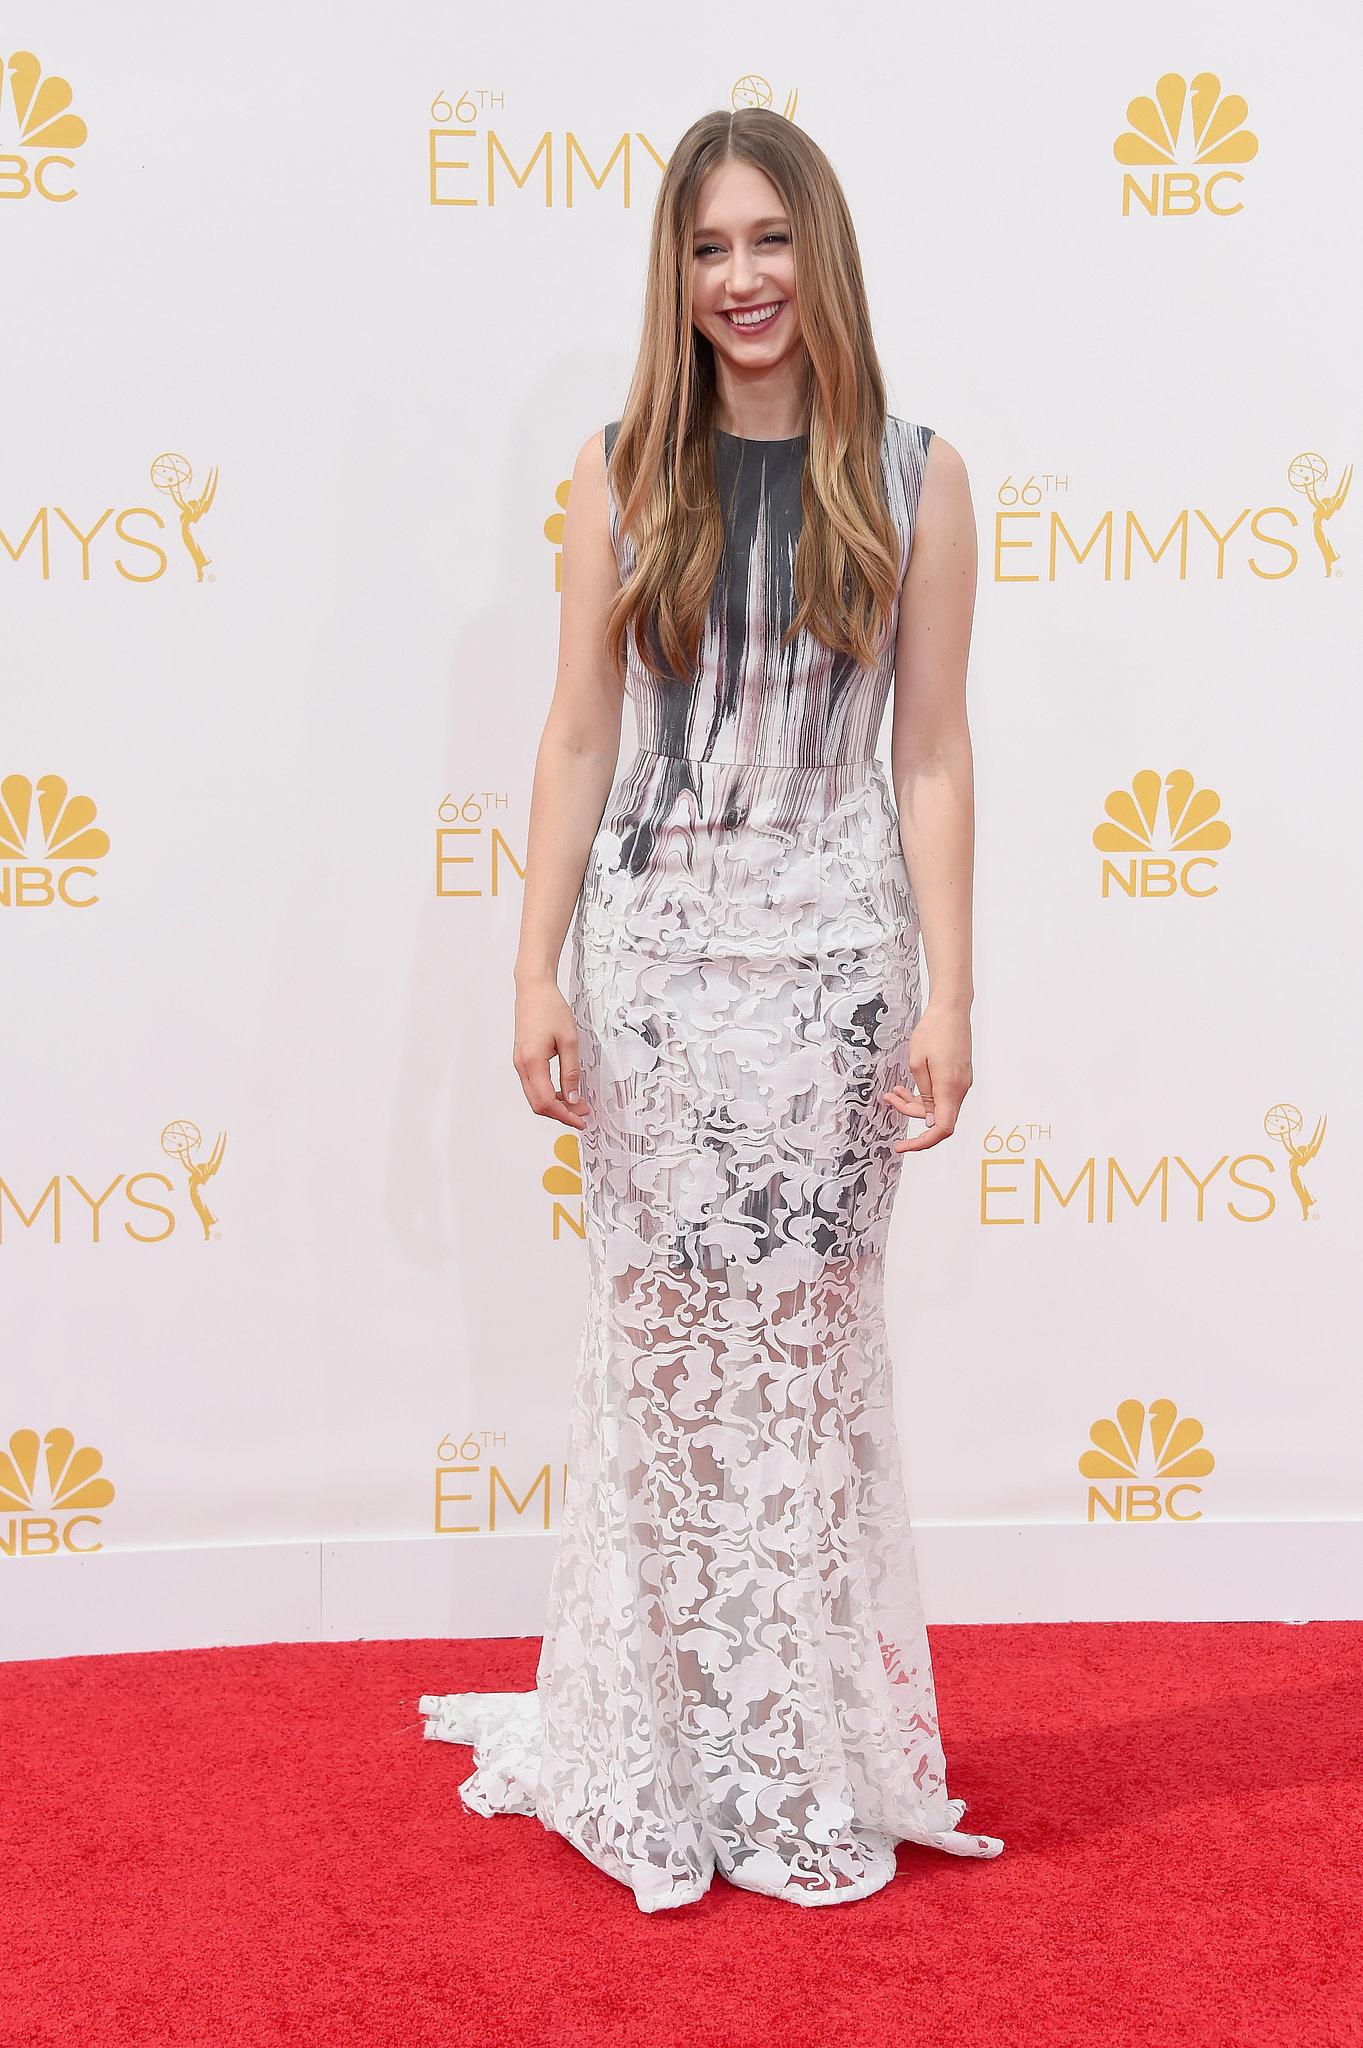 Taissa-Farmiga-2014-Emmy-Awards.jpg